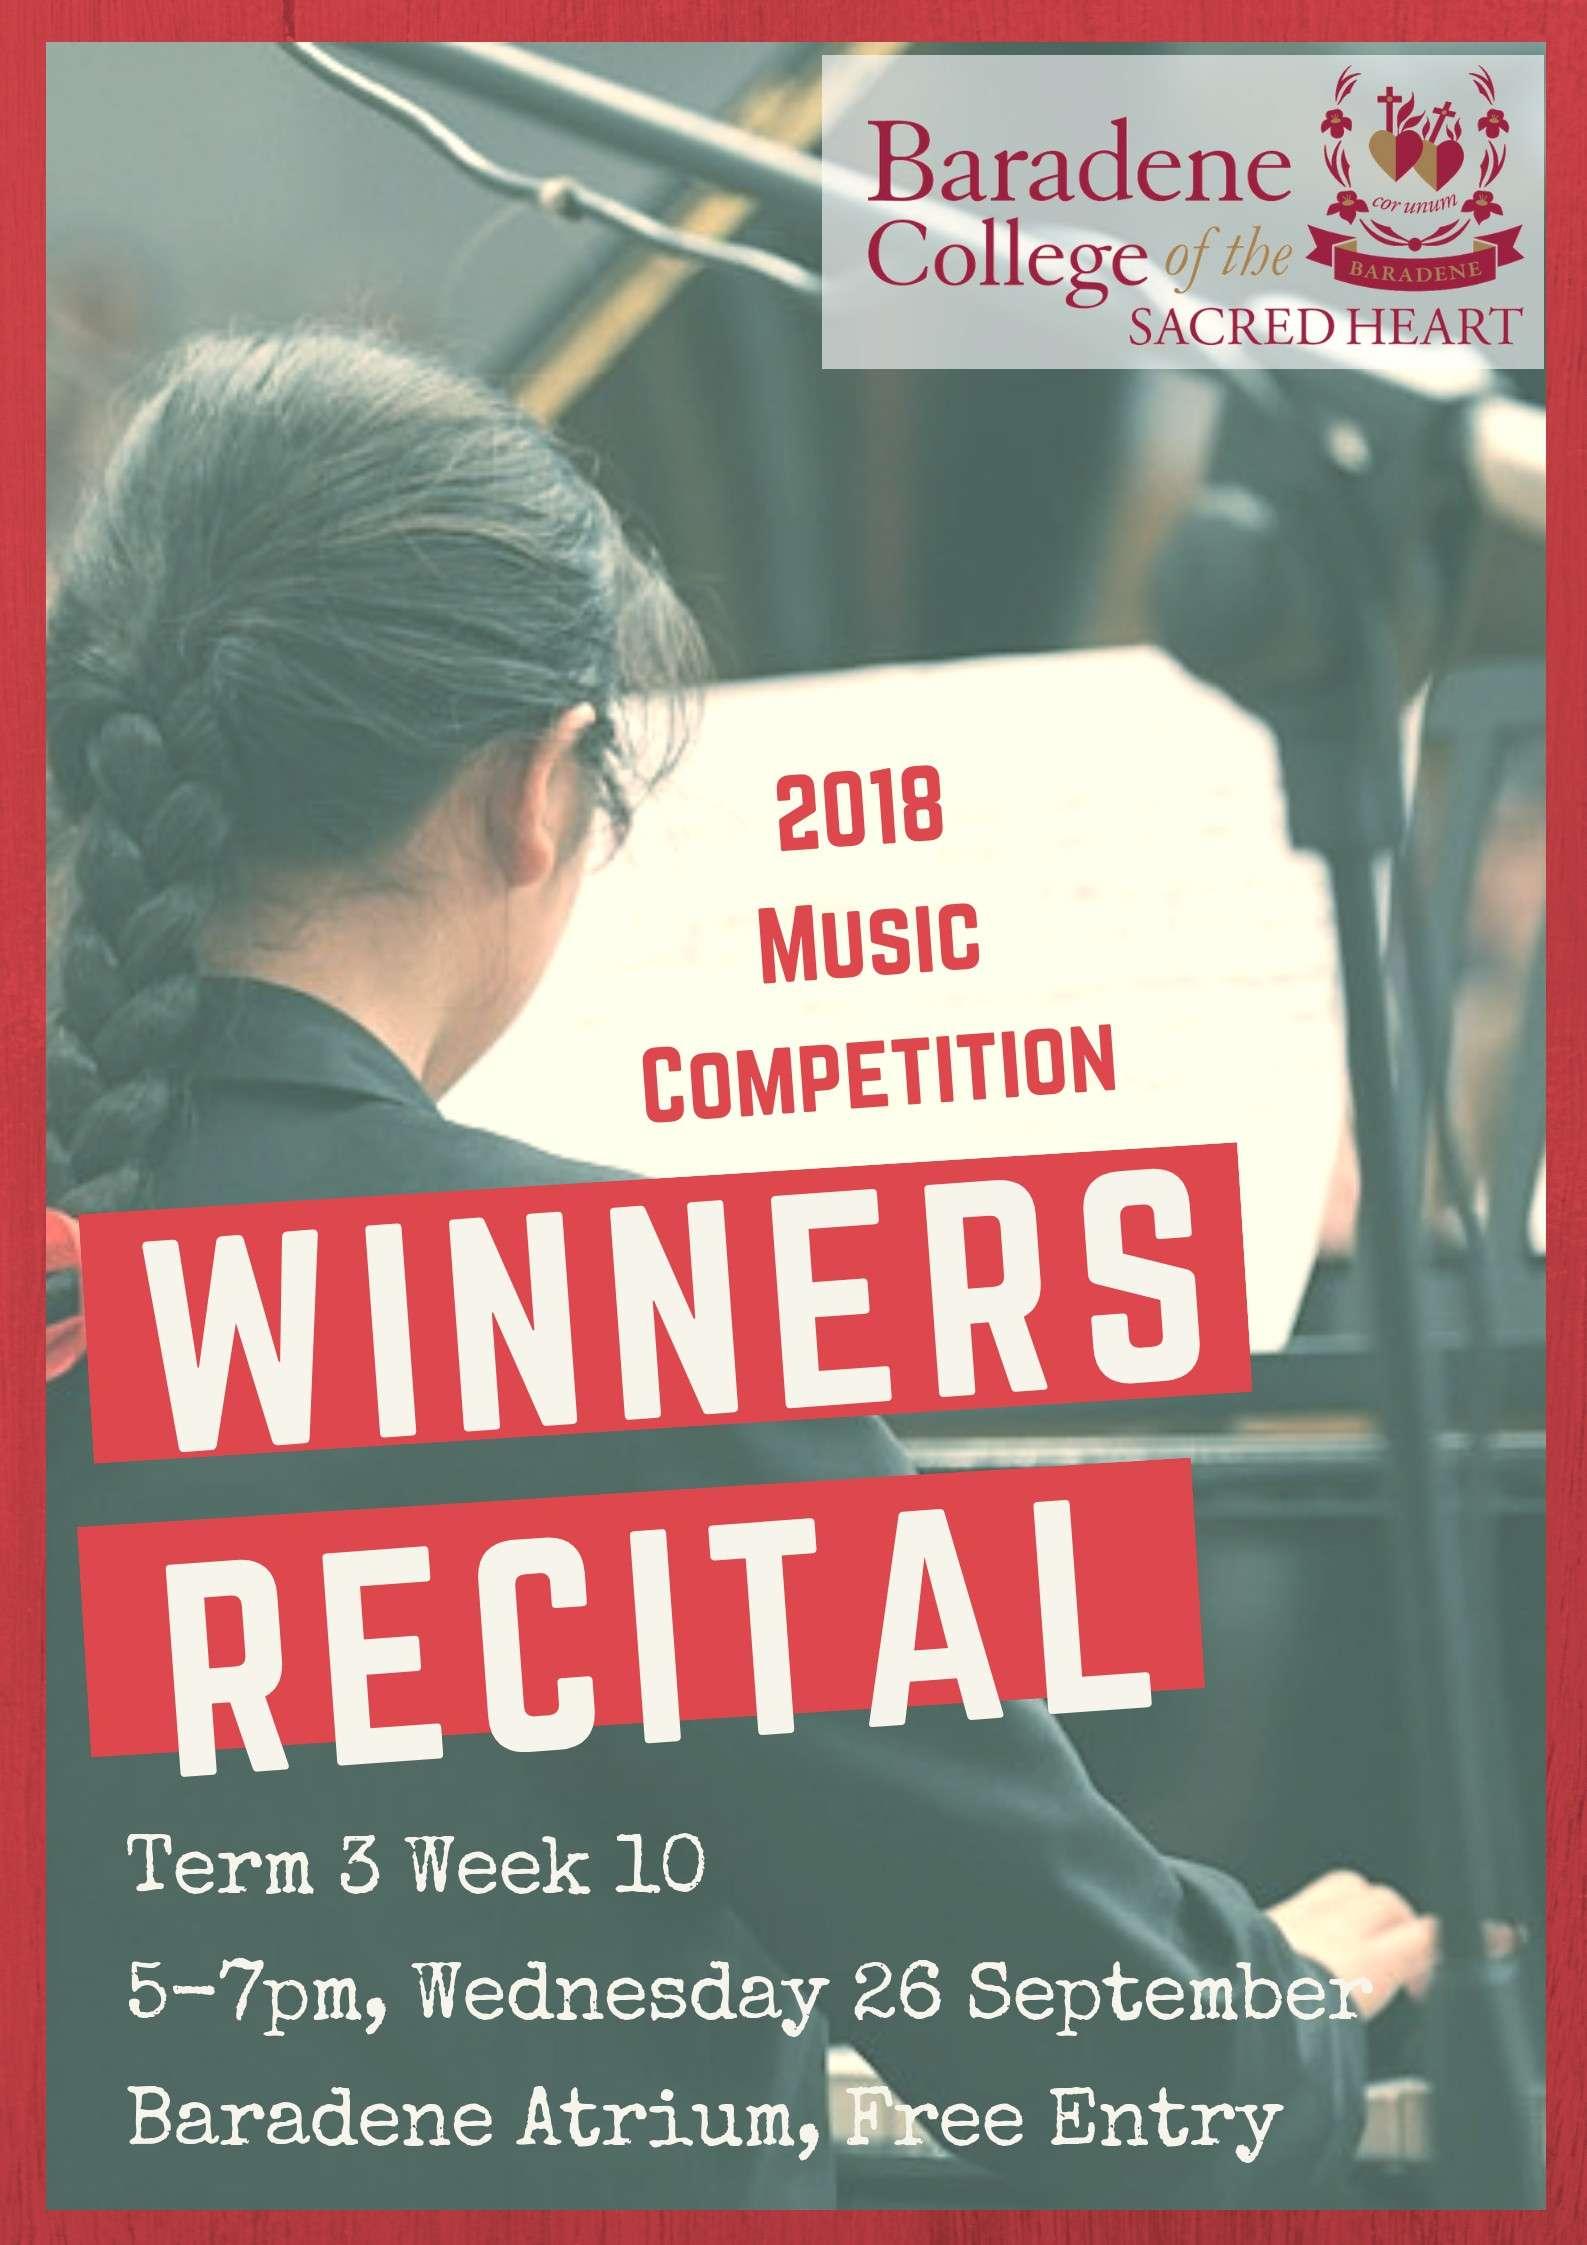 Winners Recital Version 2